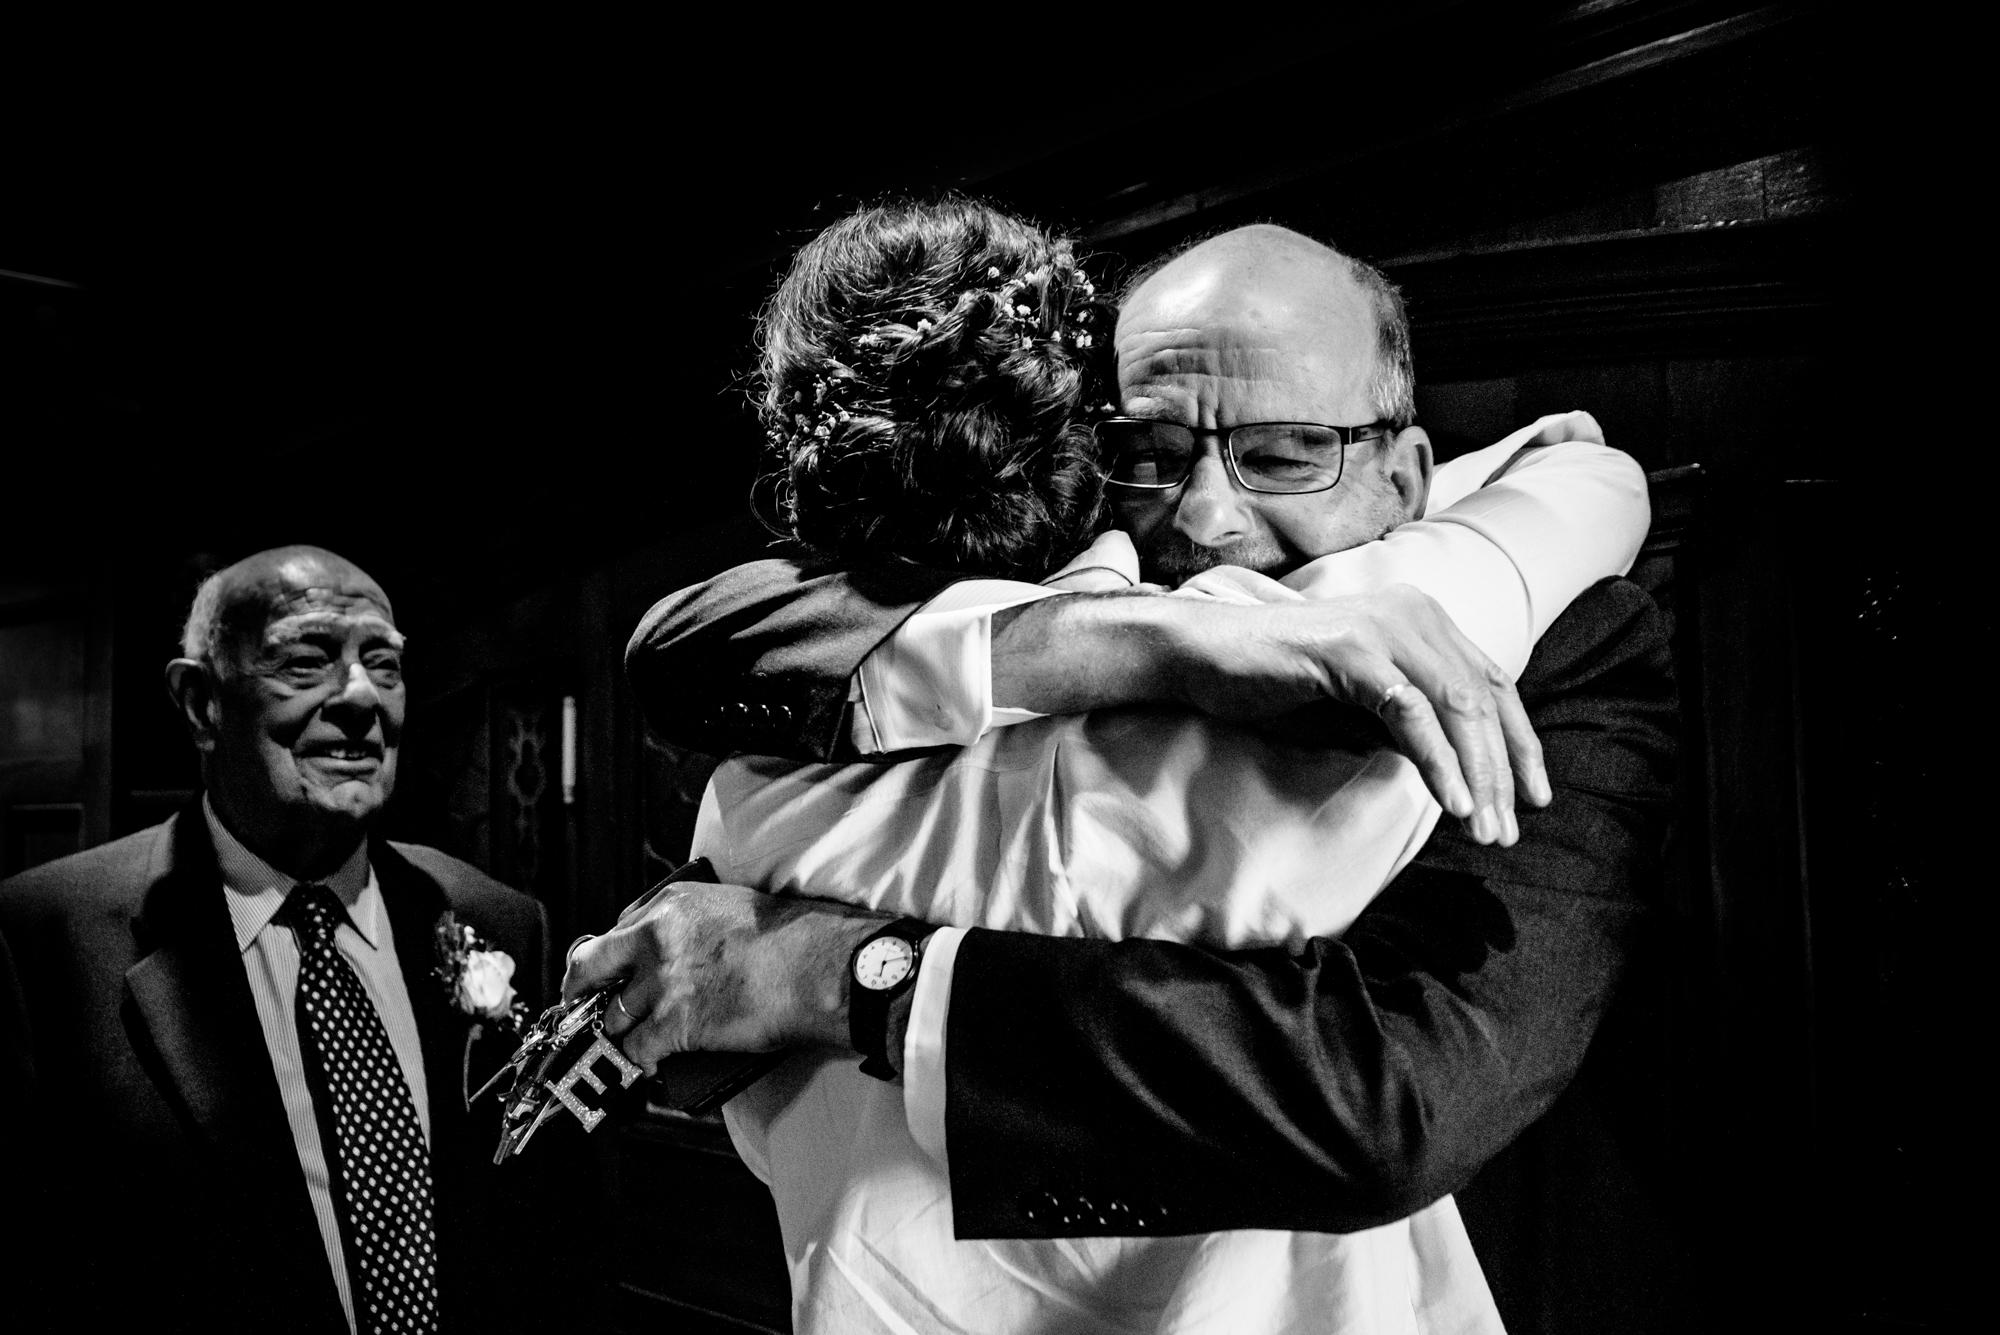 Father of he bride hug